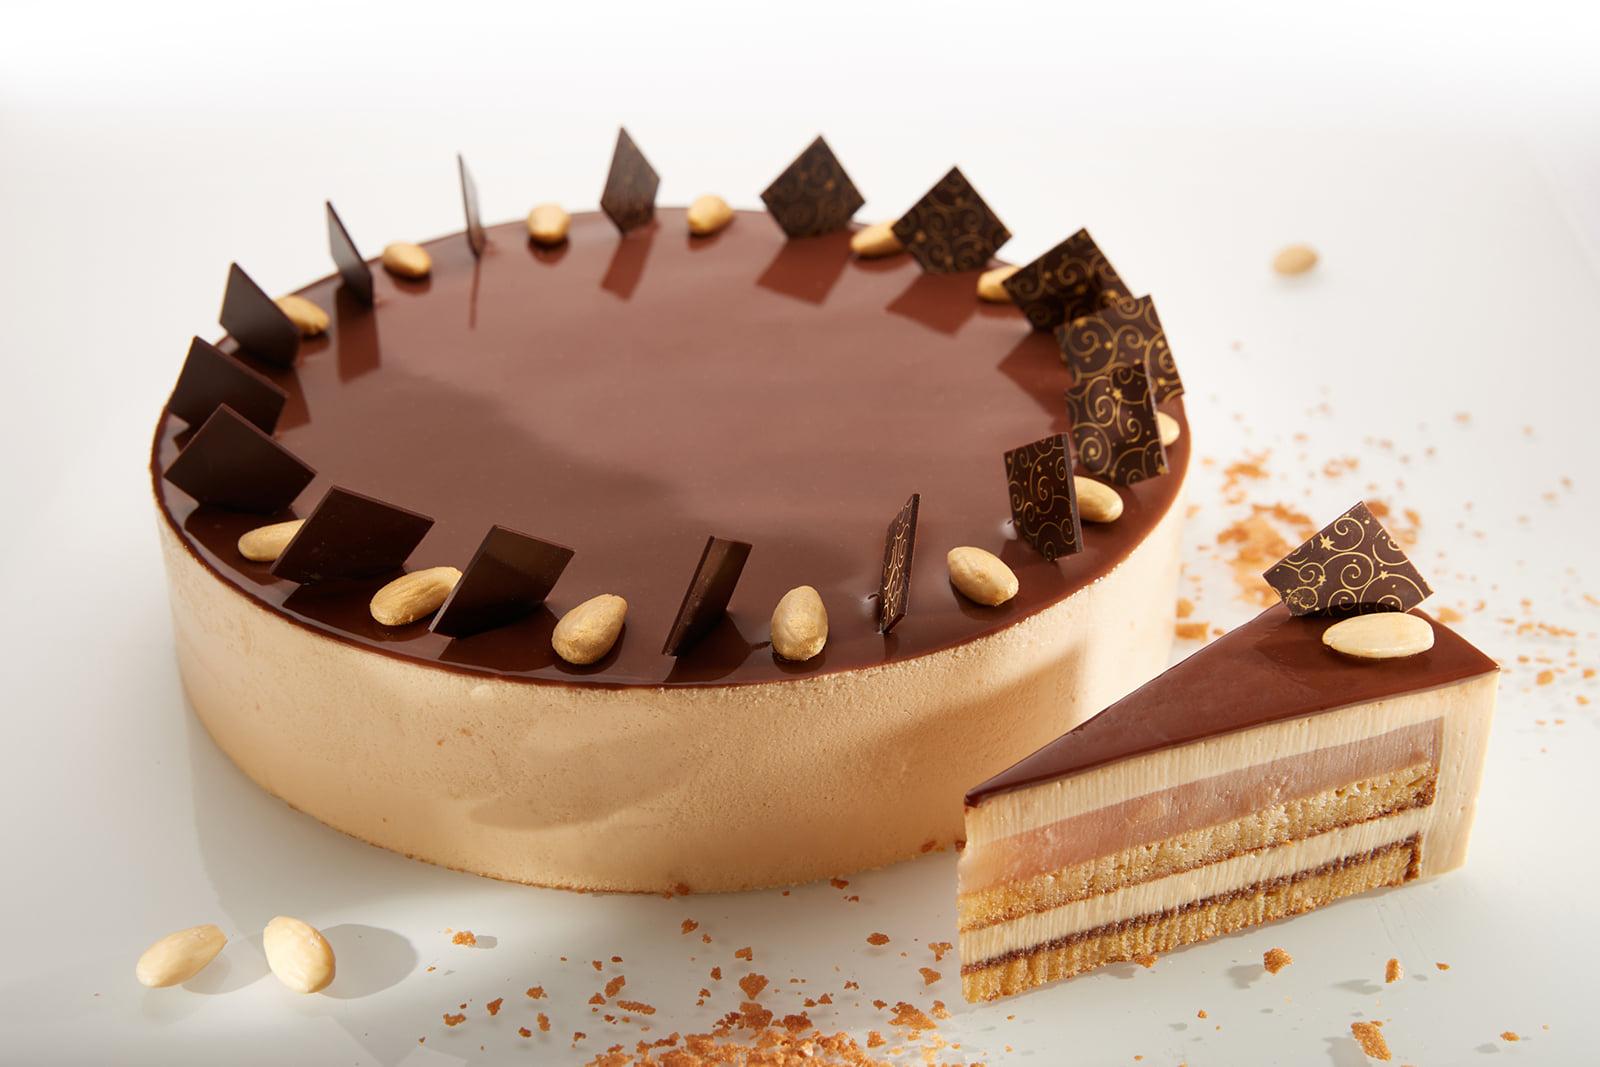 Curiositas, cake, August 20, Hungary